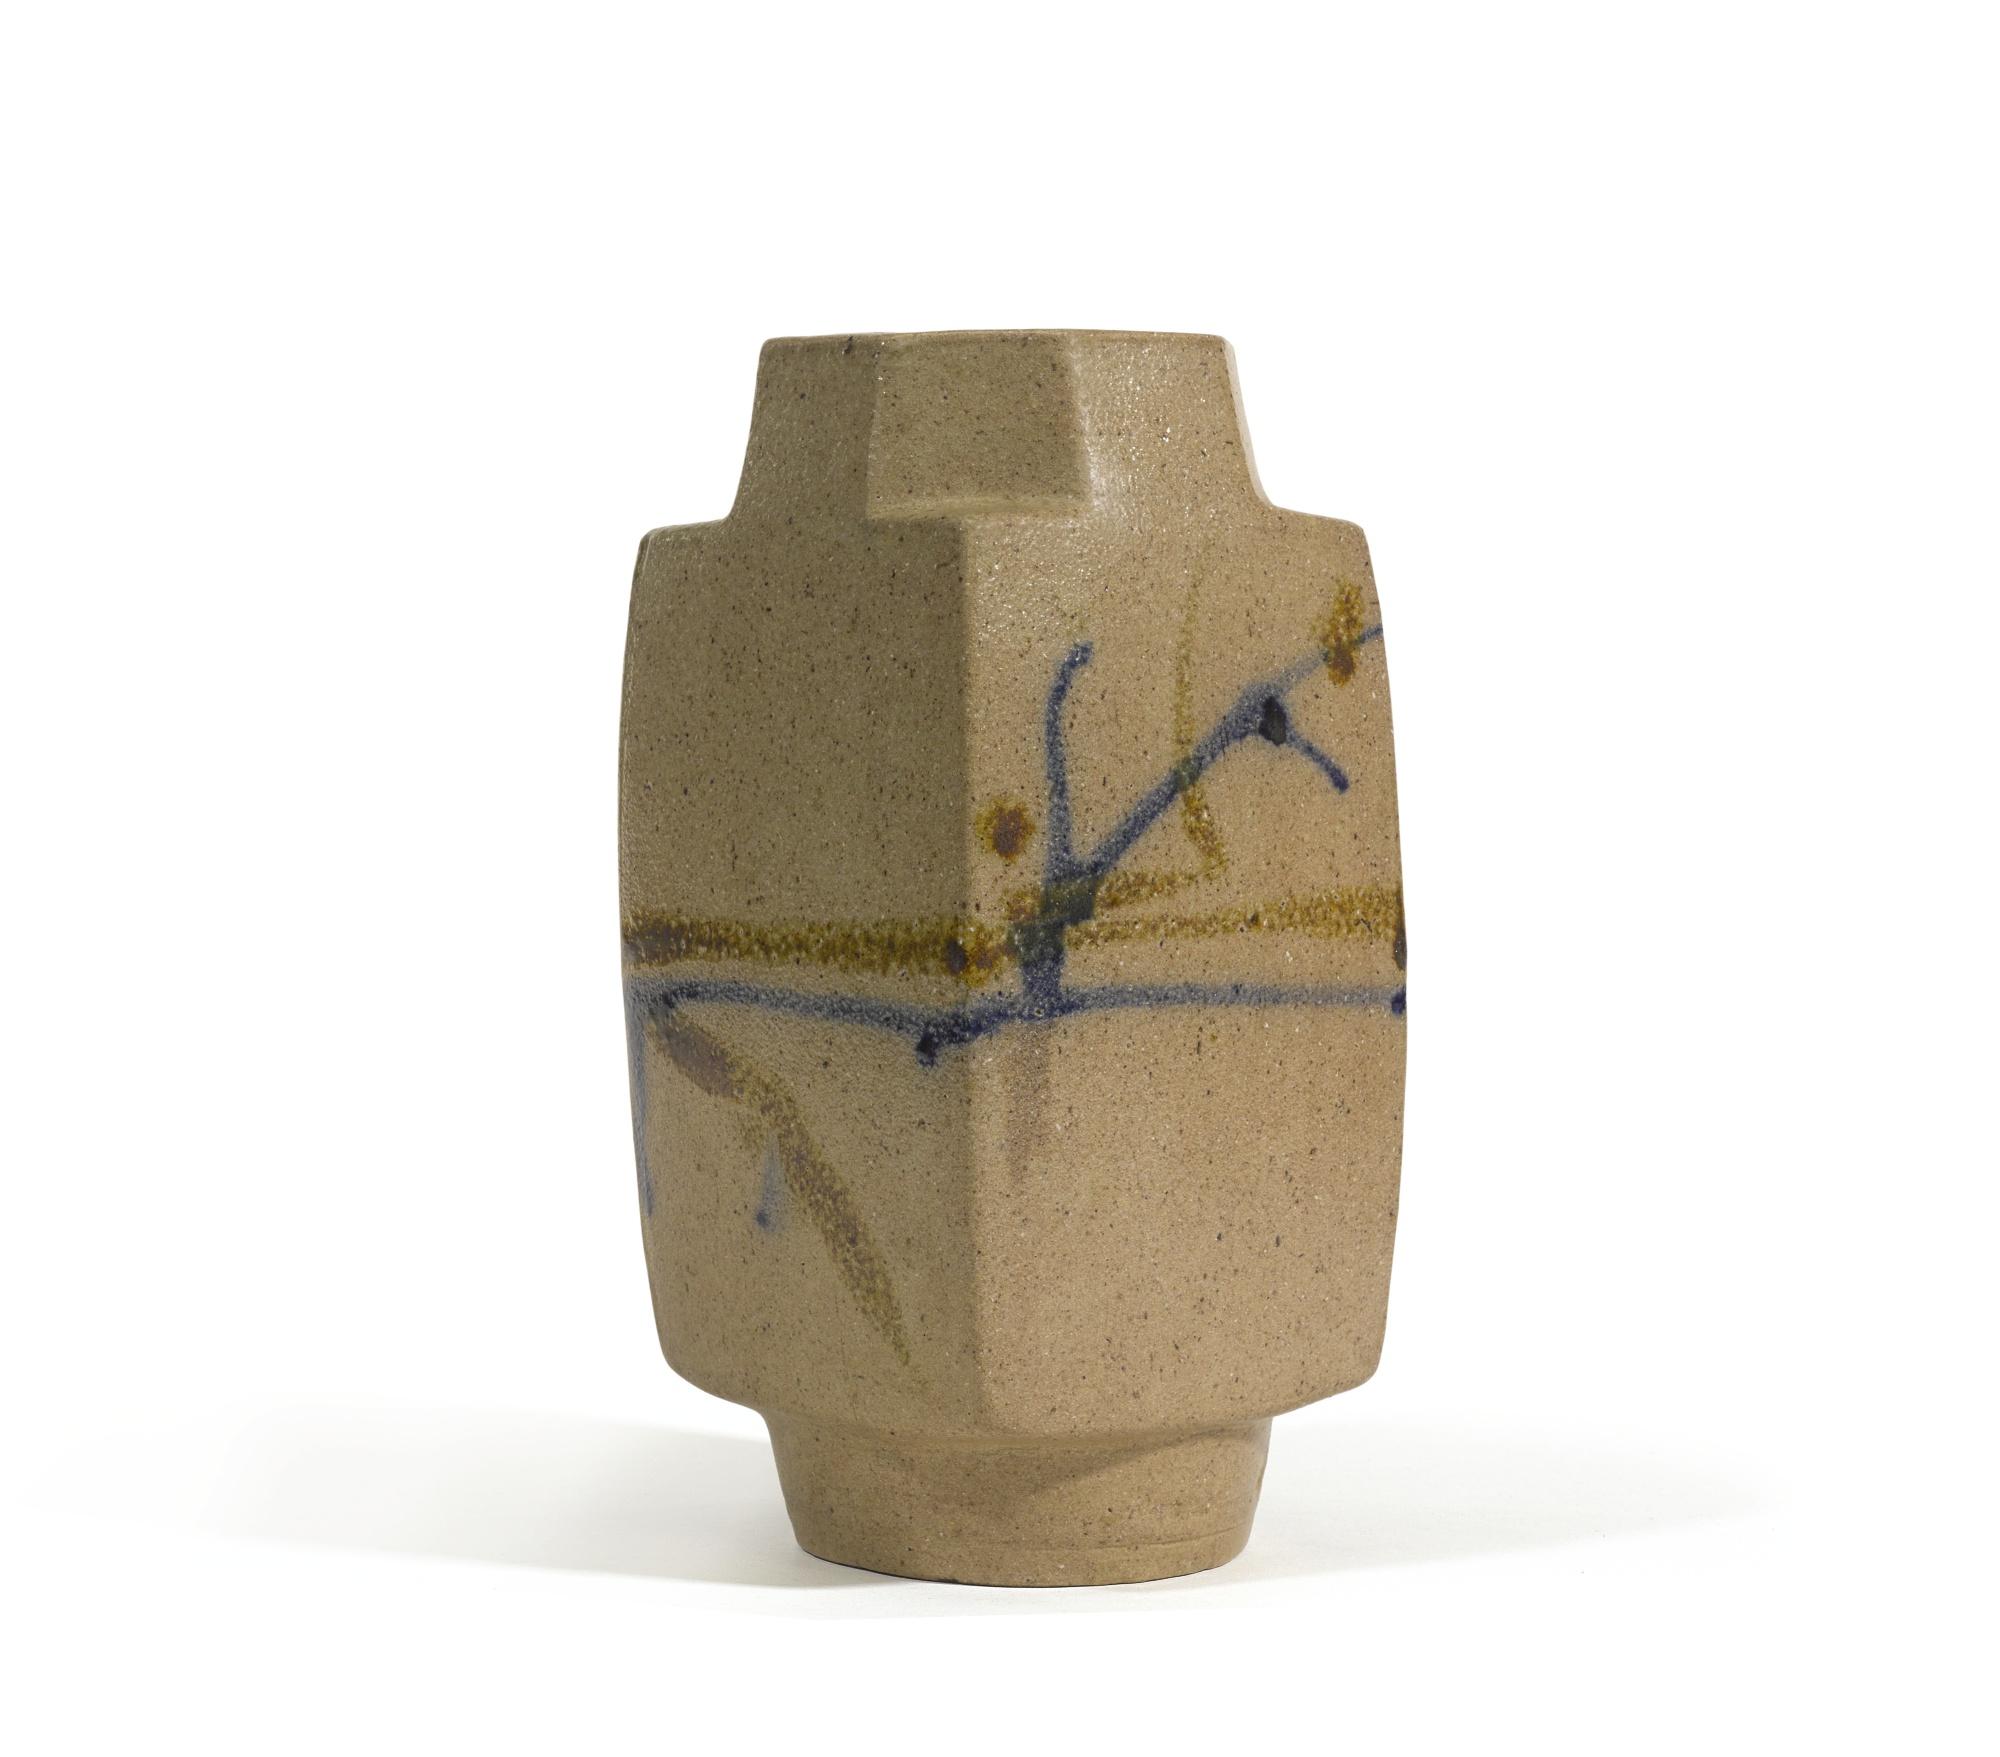 Shoji Hamada-Square Vase-